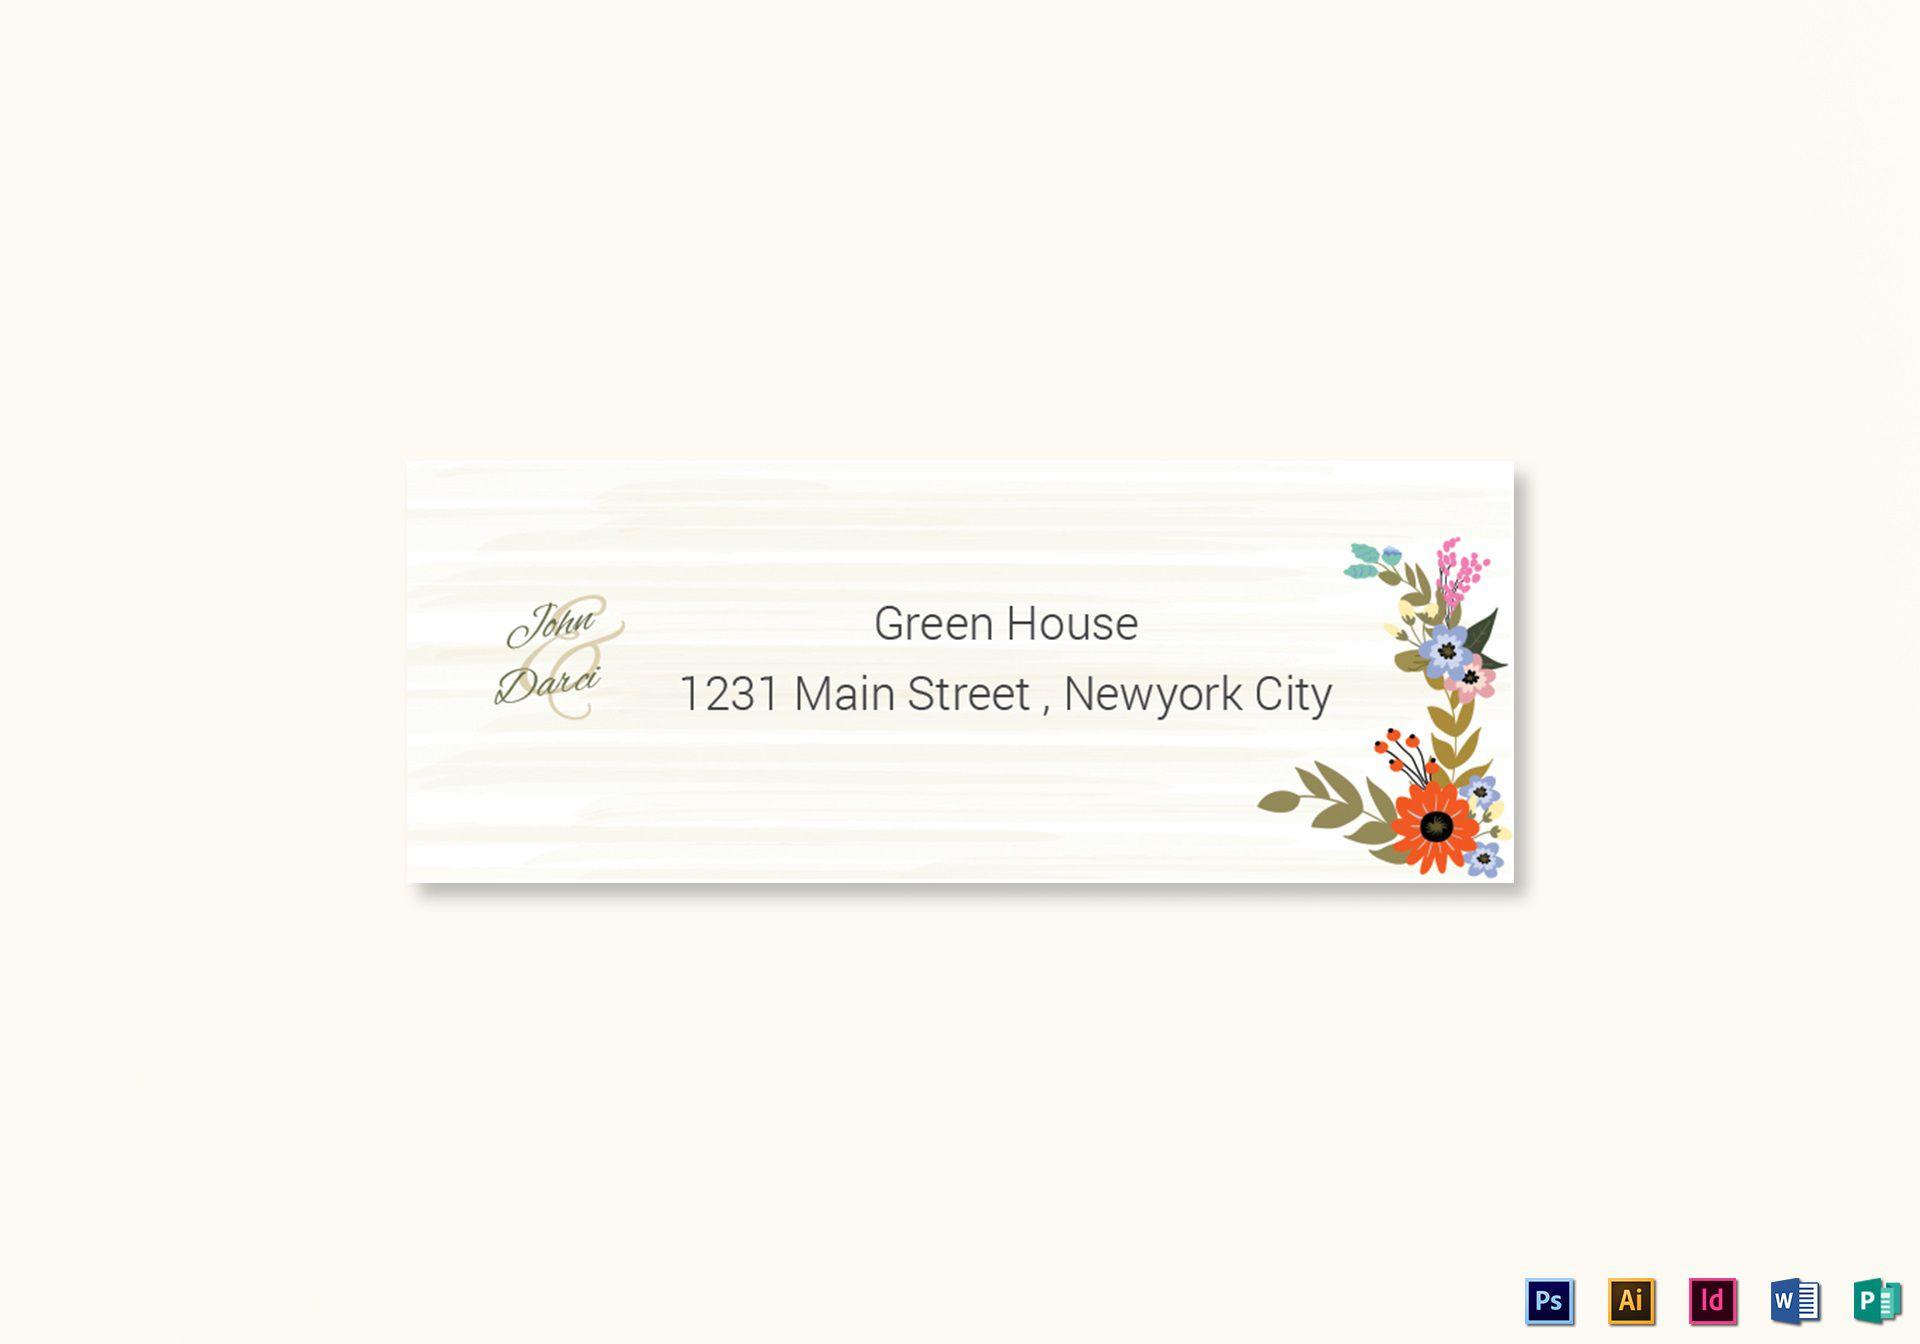 009 Top Wedding Addres Label Template High Resolution  Free PrintableFull